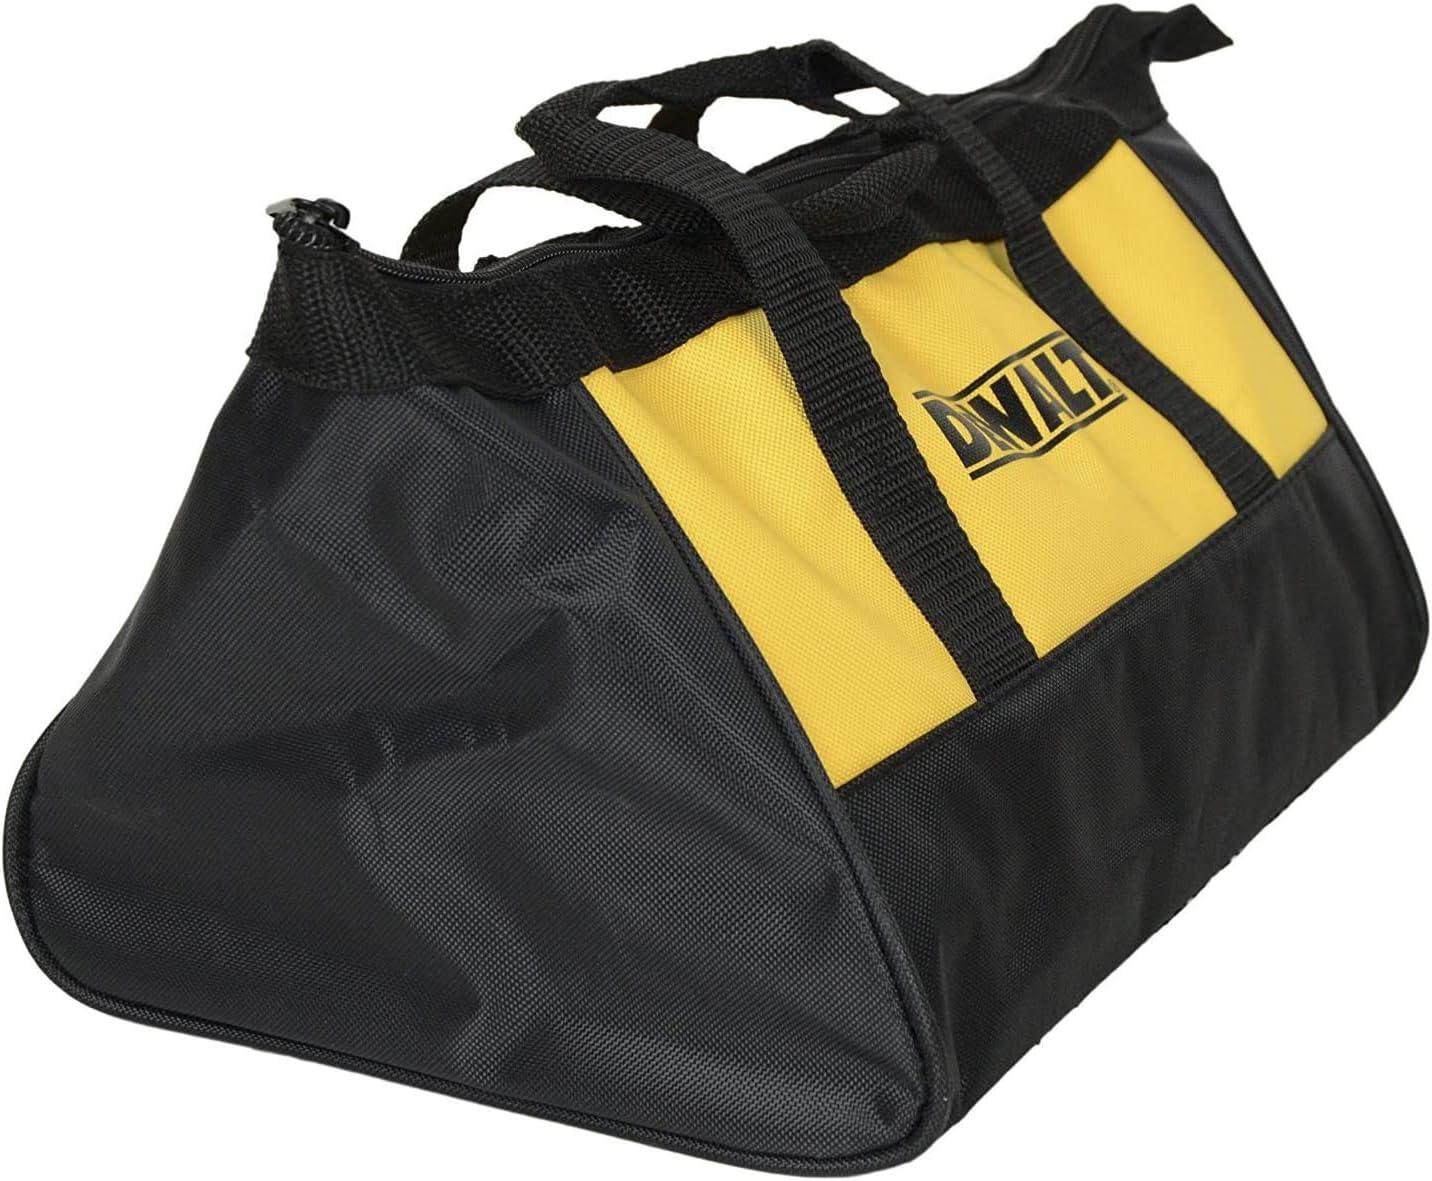 De-Walt Heavy Duty Ballistic Nylon Contractor Tool Bag 11-Inch